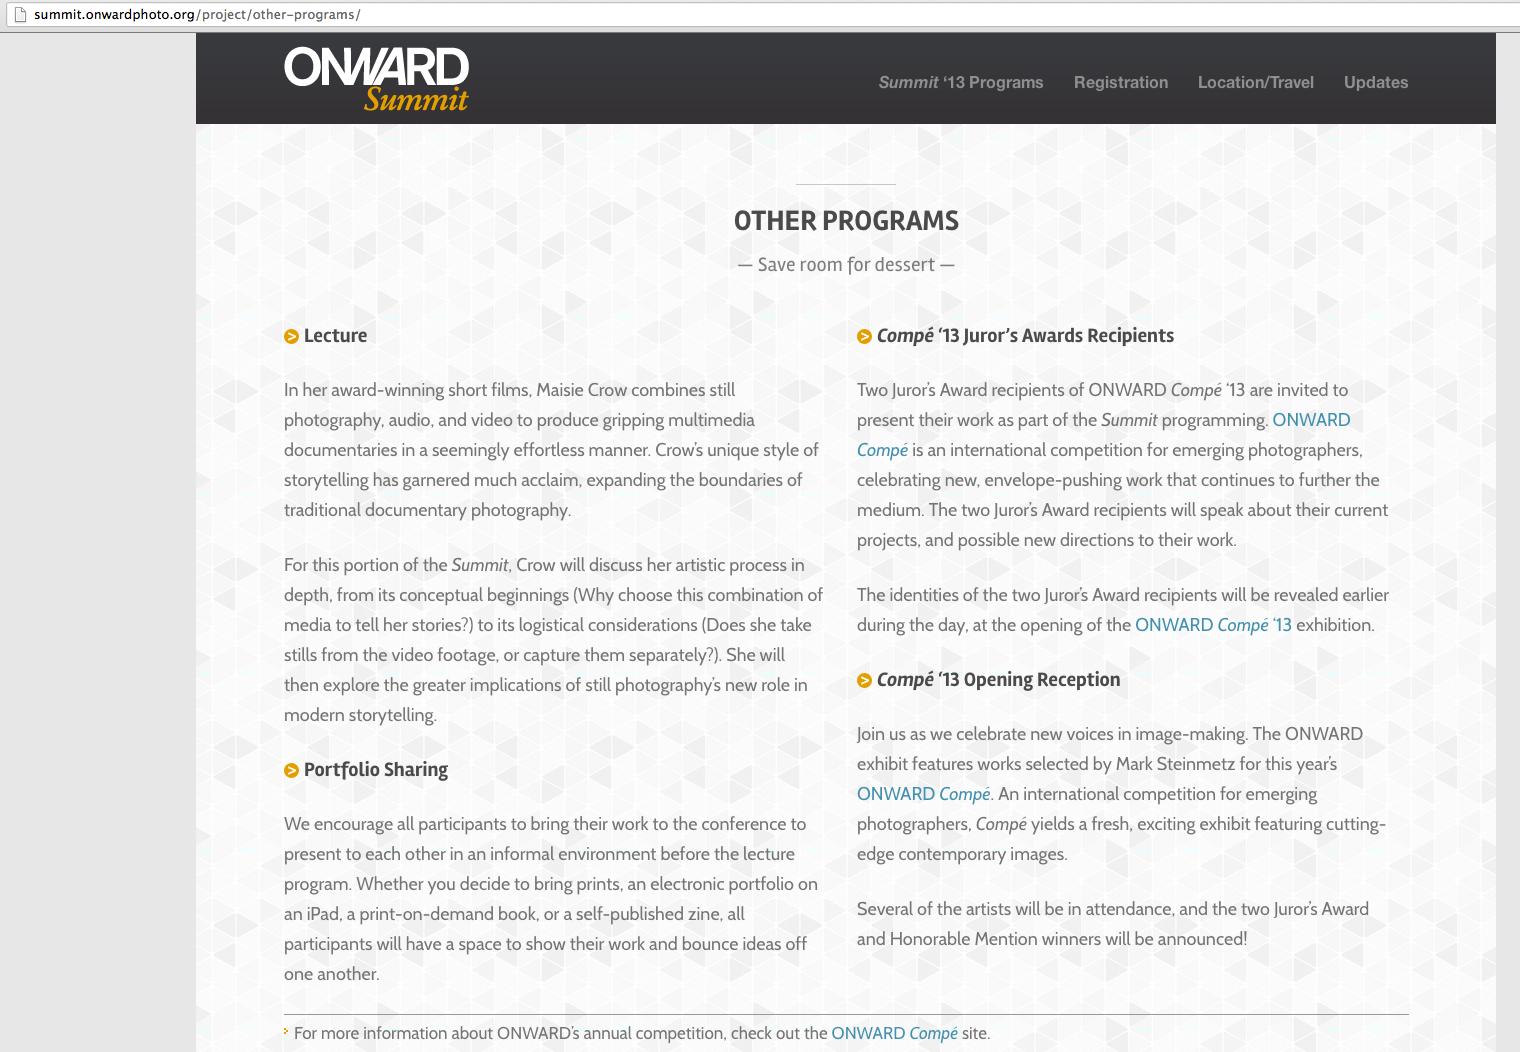 screenshot-onward-summit-2013-01.png